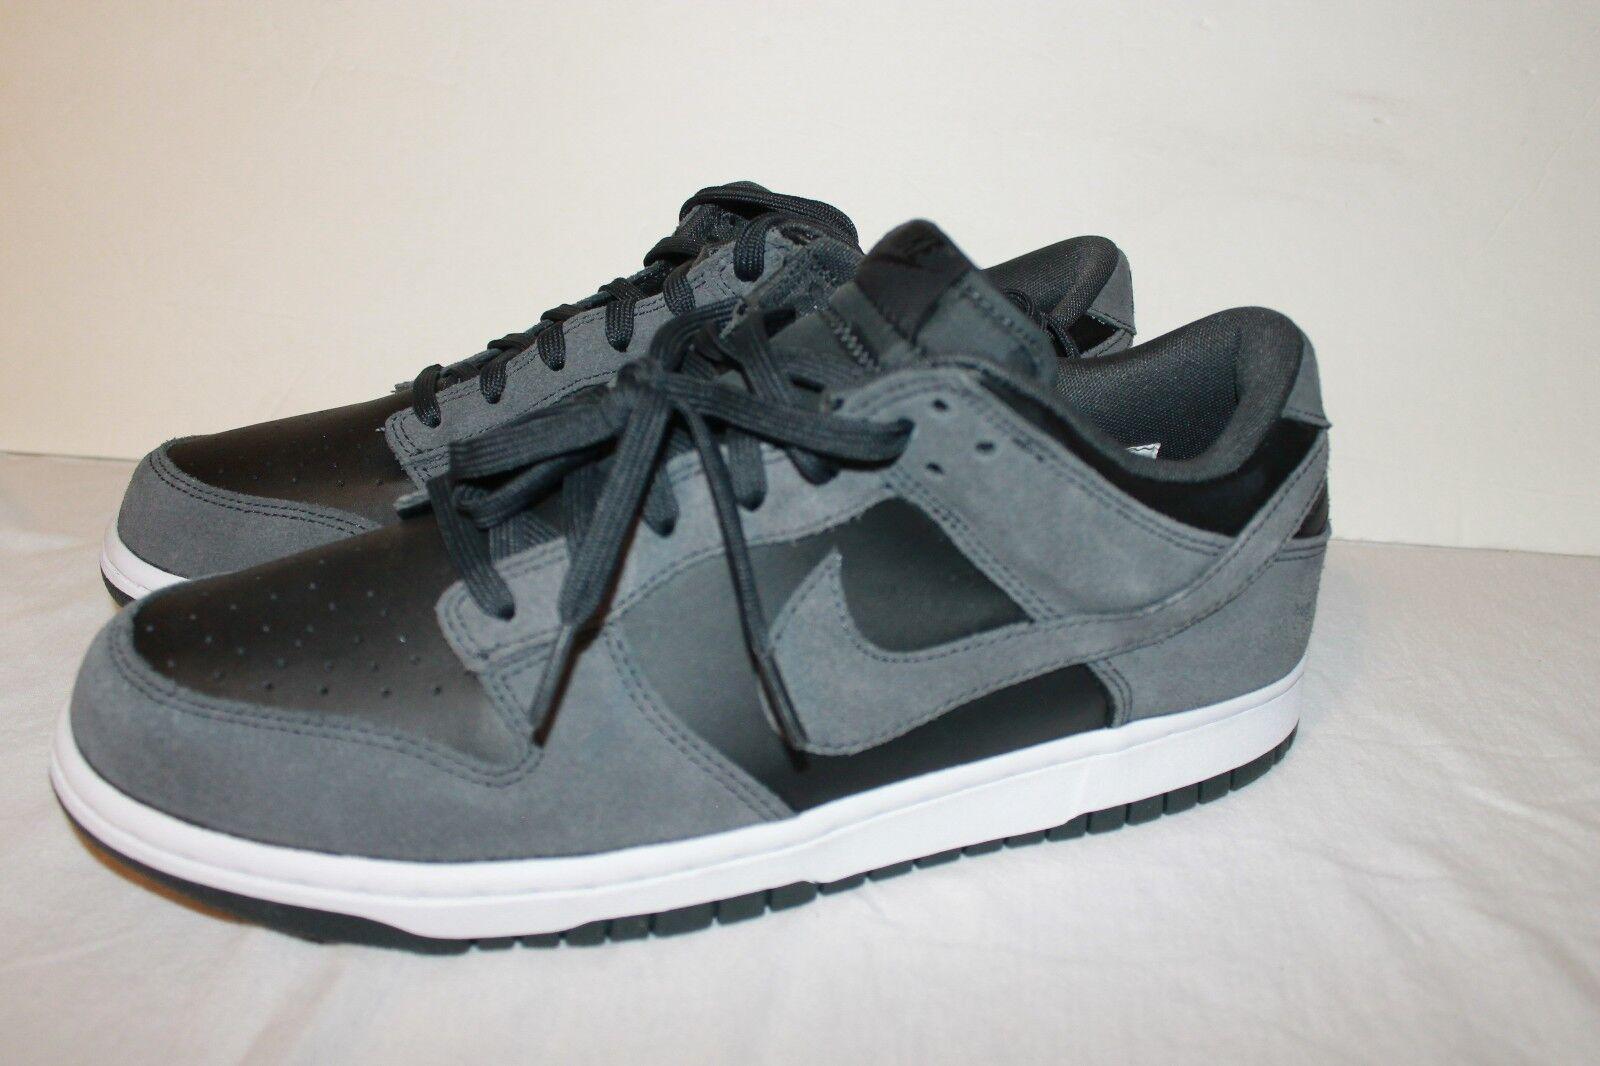 Nike dunk low 904234-004 skateboarding air leder skateboarding 904234-004 anthracite 11,5 ff5cfd